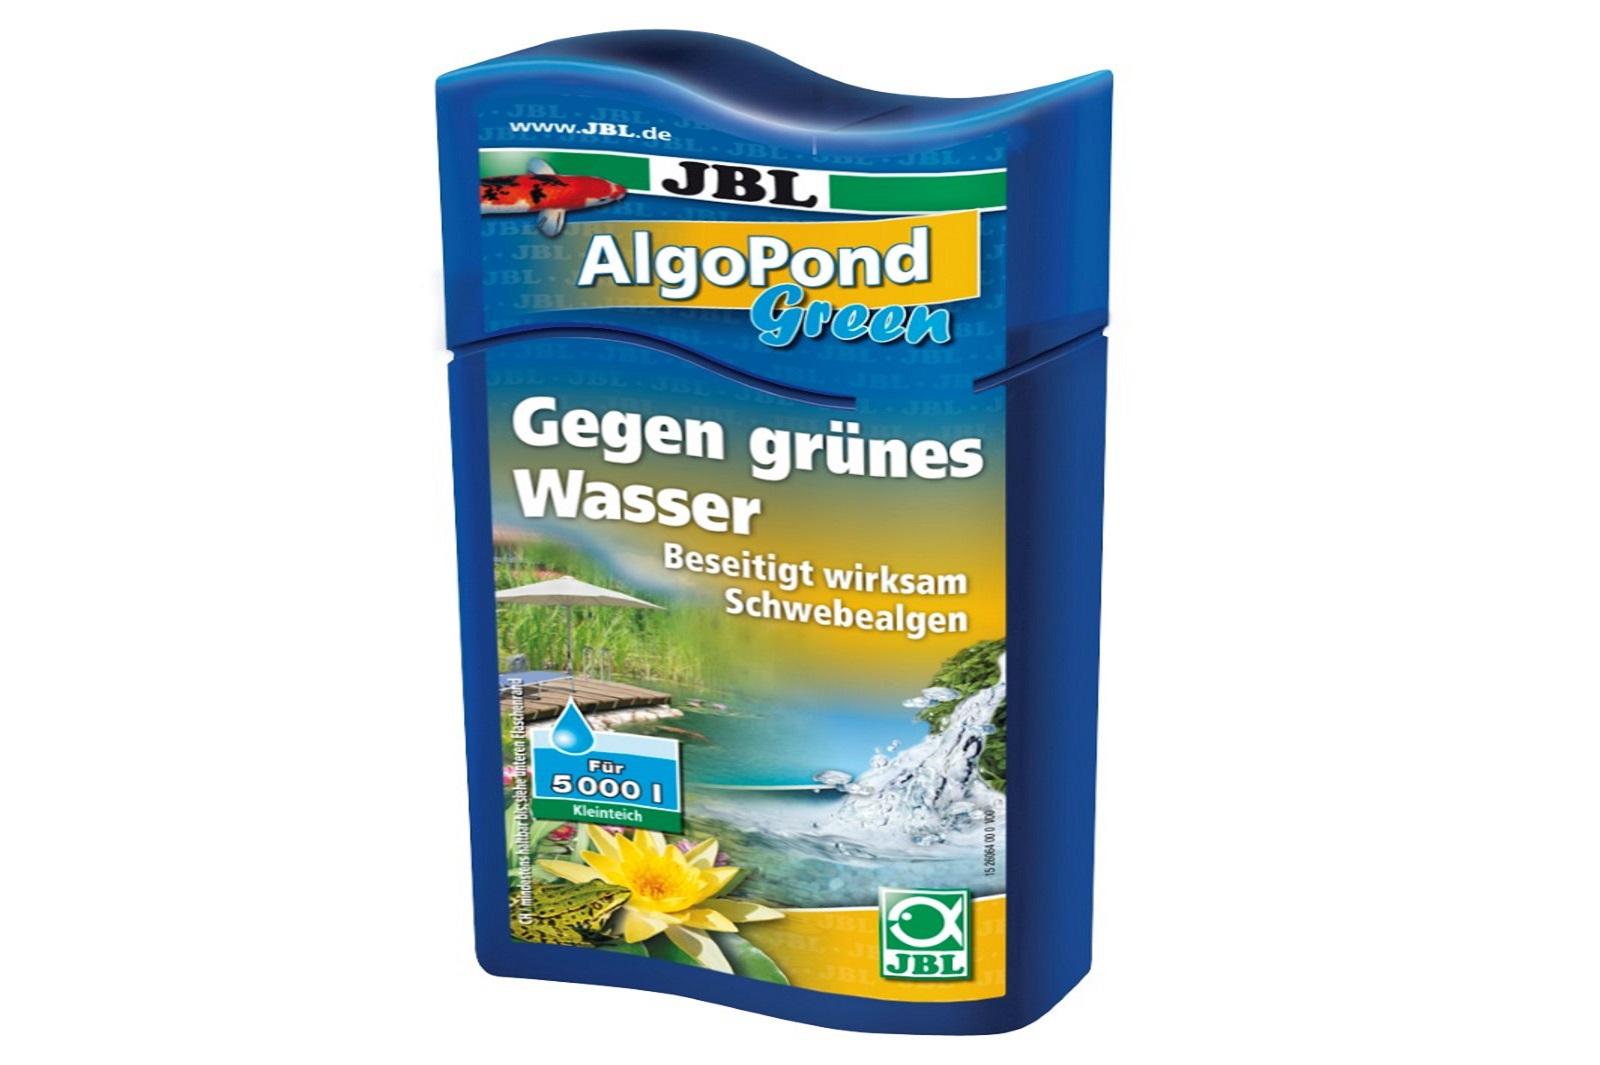 JBL AlgoPond Green 250 ml gegen grünes Wasser löst Algenprobleme